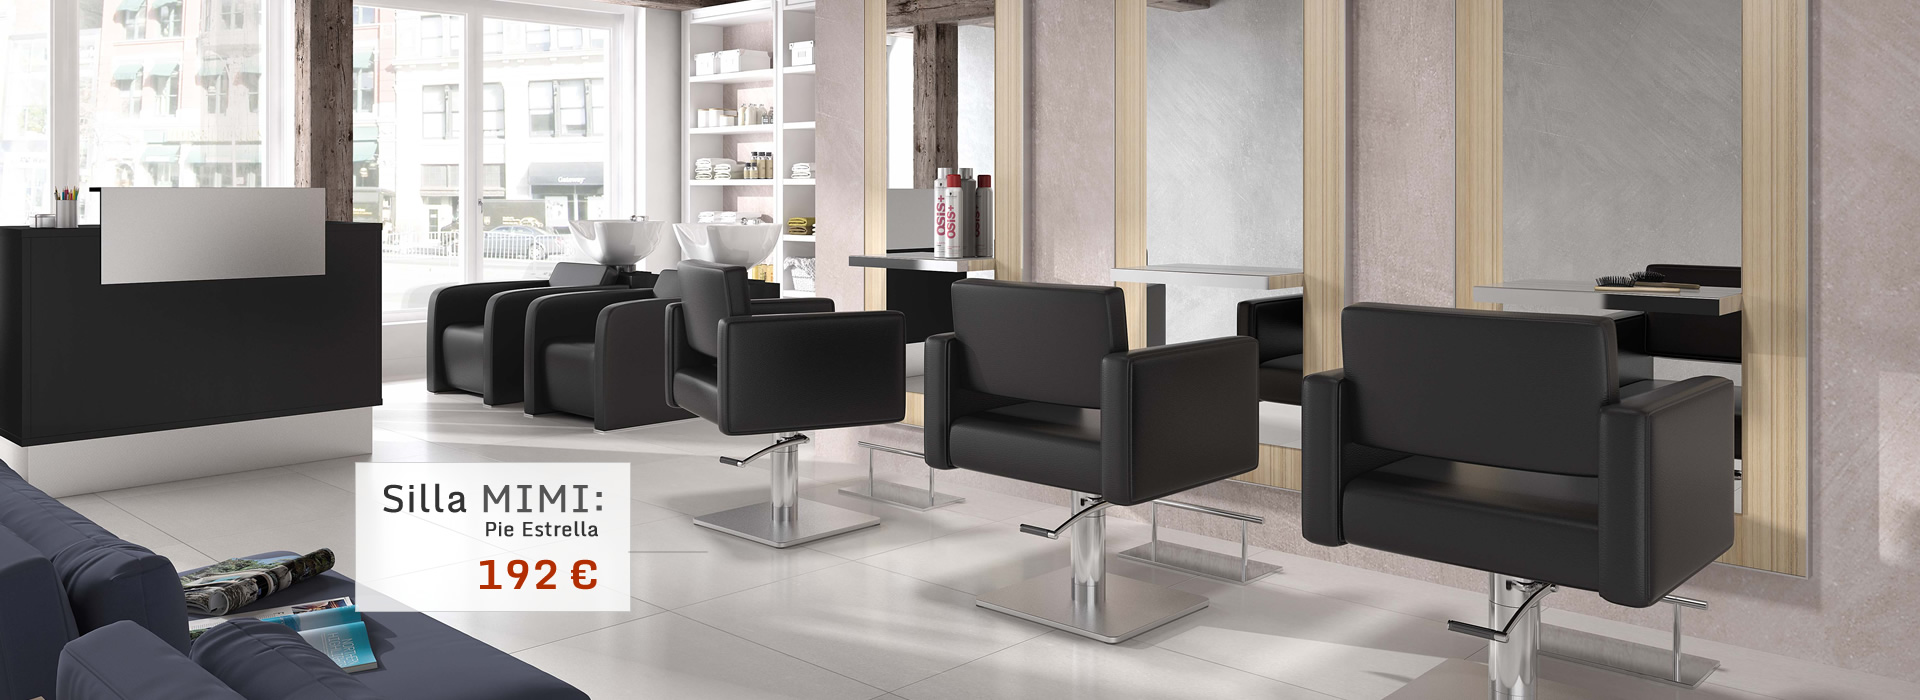 Mobiliario de peluqueria for Mobiliario empresas